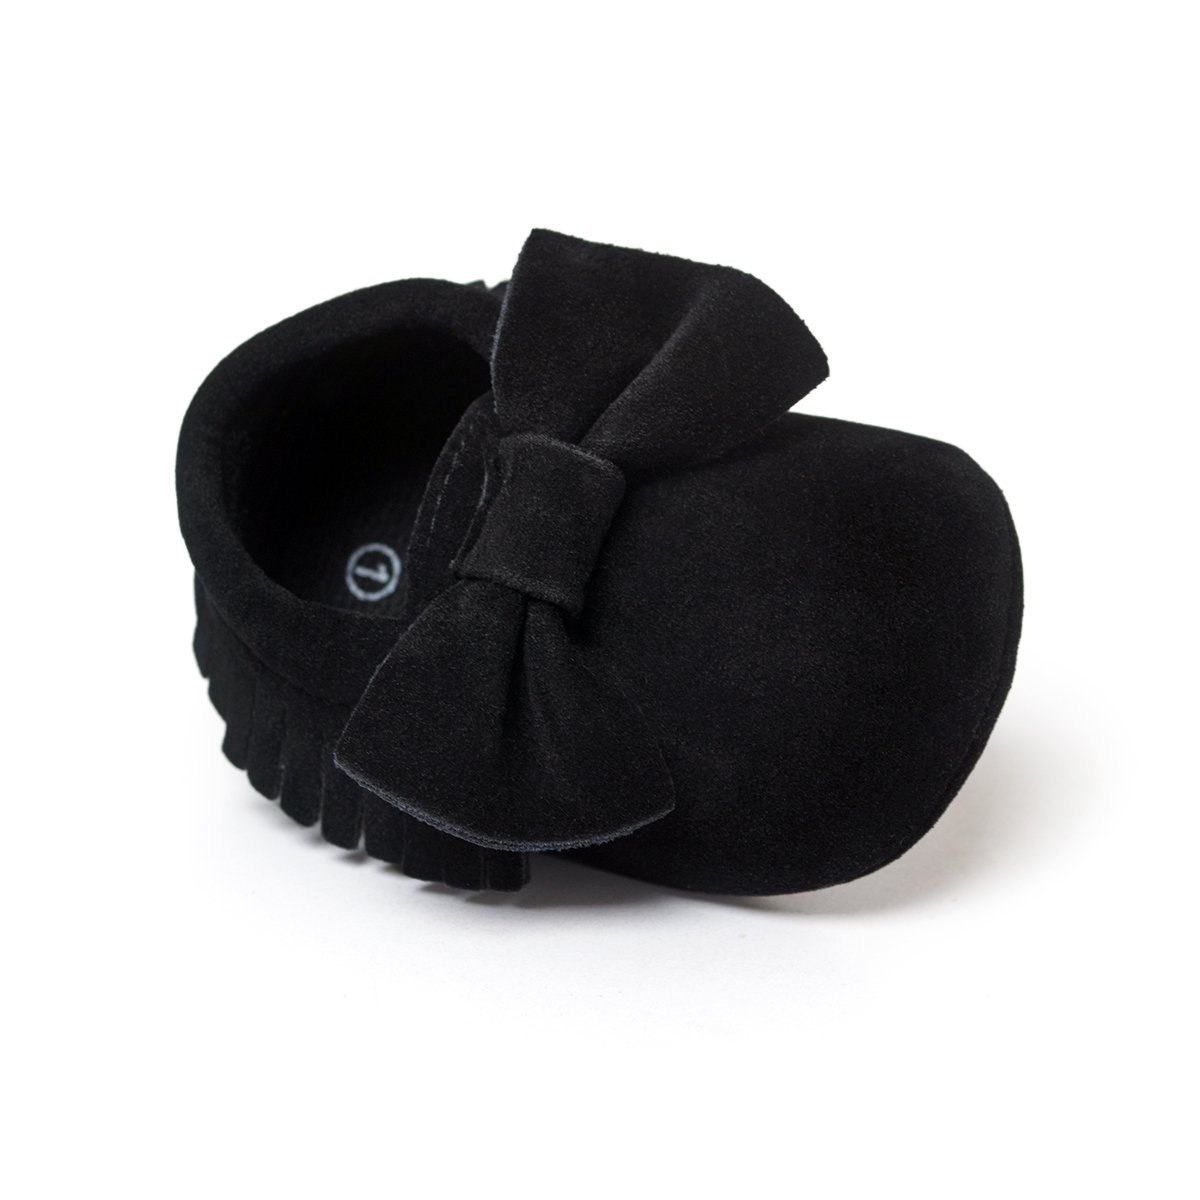 LIVEBOX Infant Baby Girls and Boys Premium Soft Sole Moccasins Tassels Prewalker Anti-Slip Toddler Shoes (S: 0~6 Months, Bow-Black)